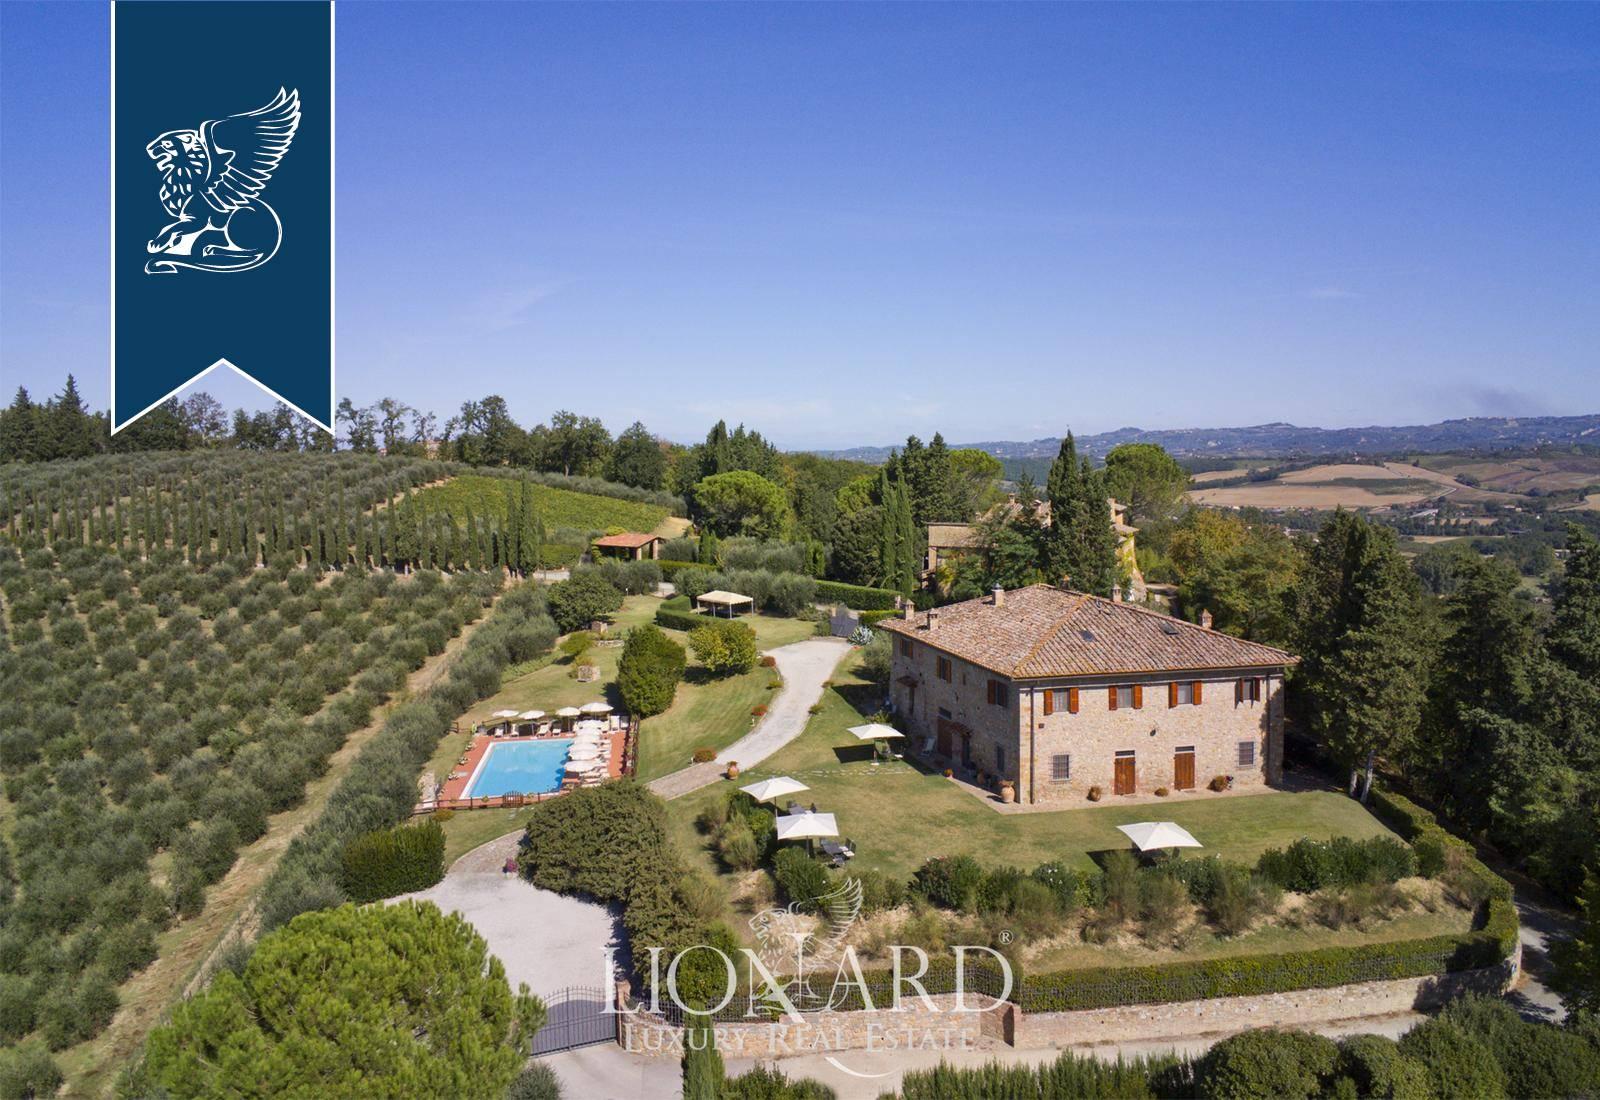 Agriturismo in Vendita a San Gimignano: 0 locali, 900 mq - Foto 2